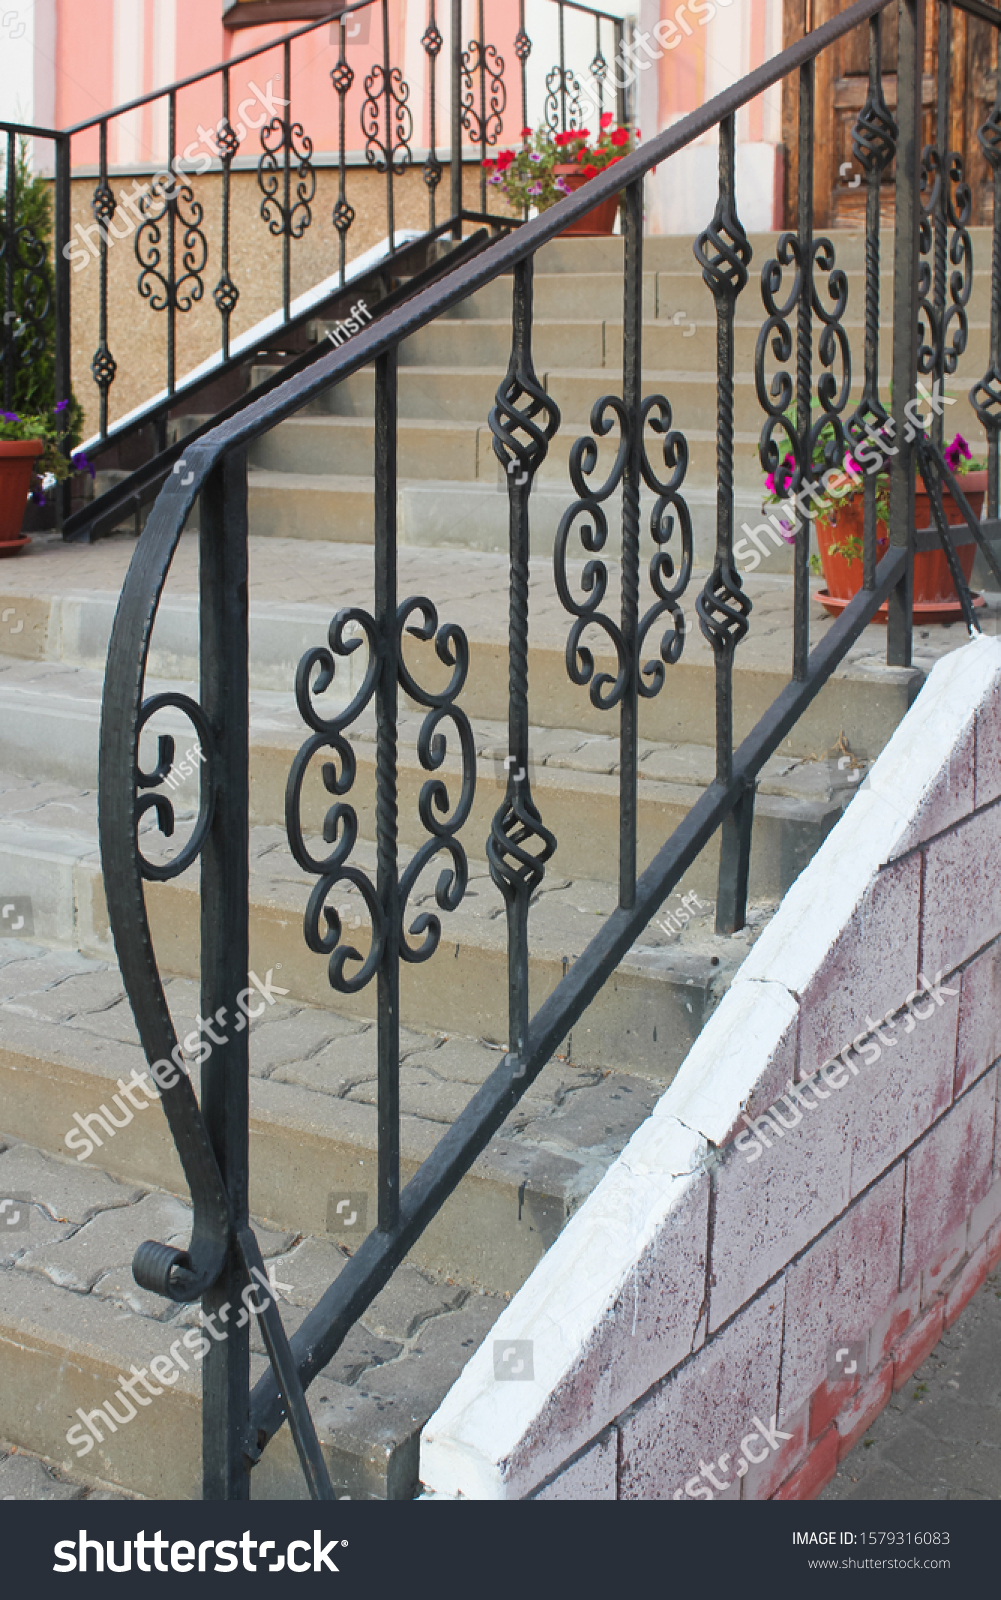 stock-photo-black-wrought-iron-railing-w